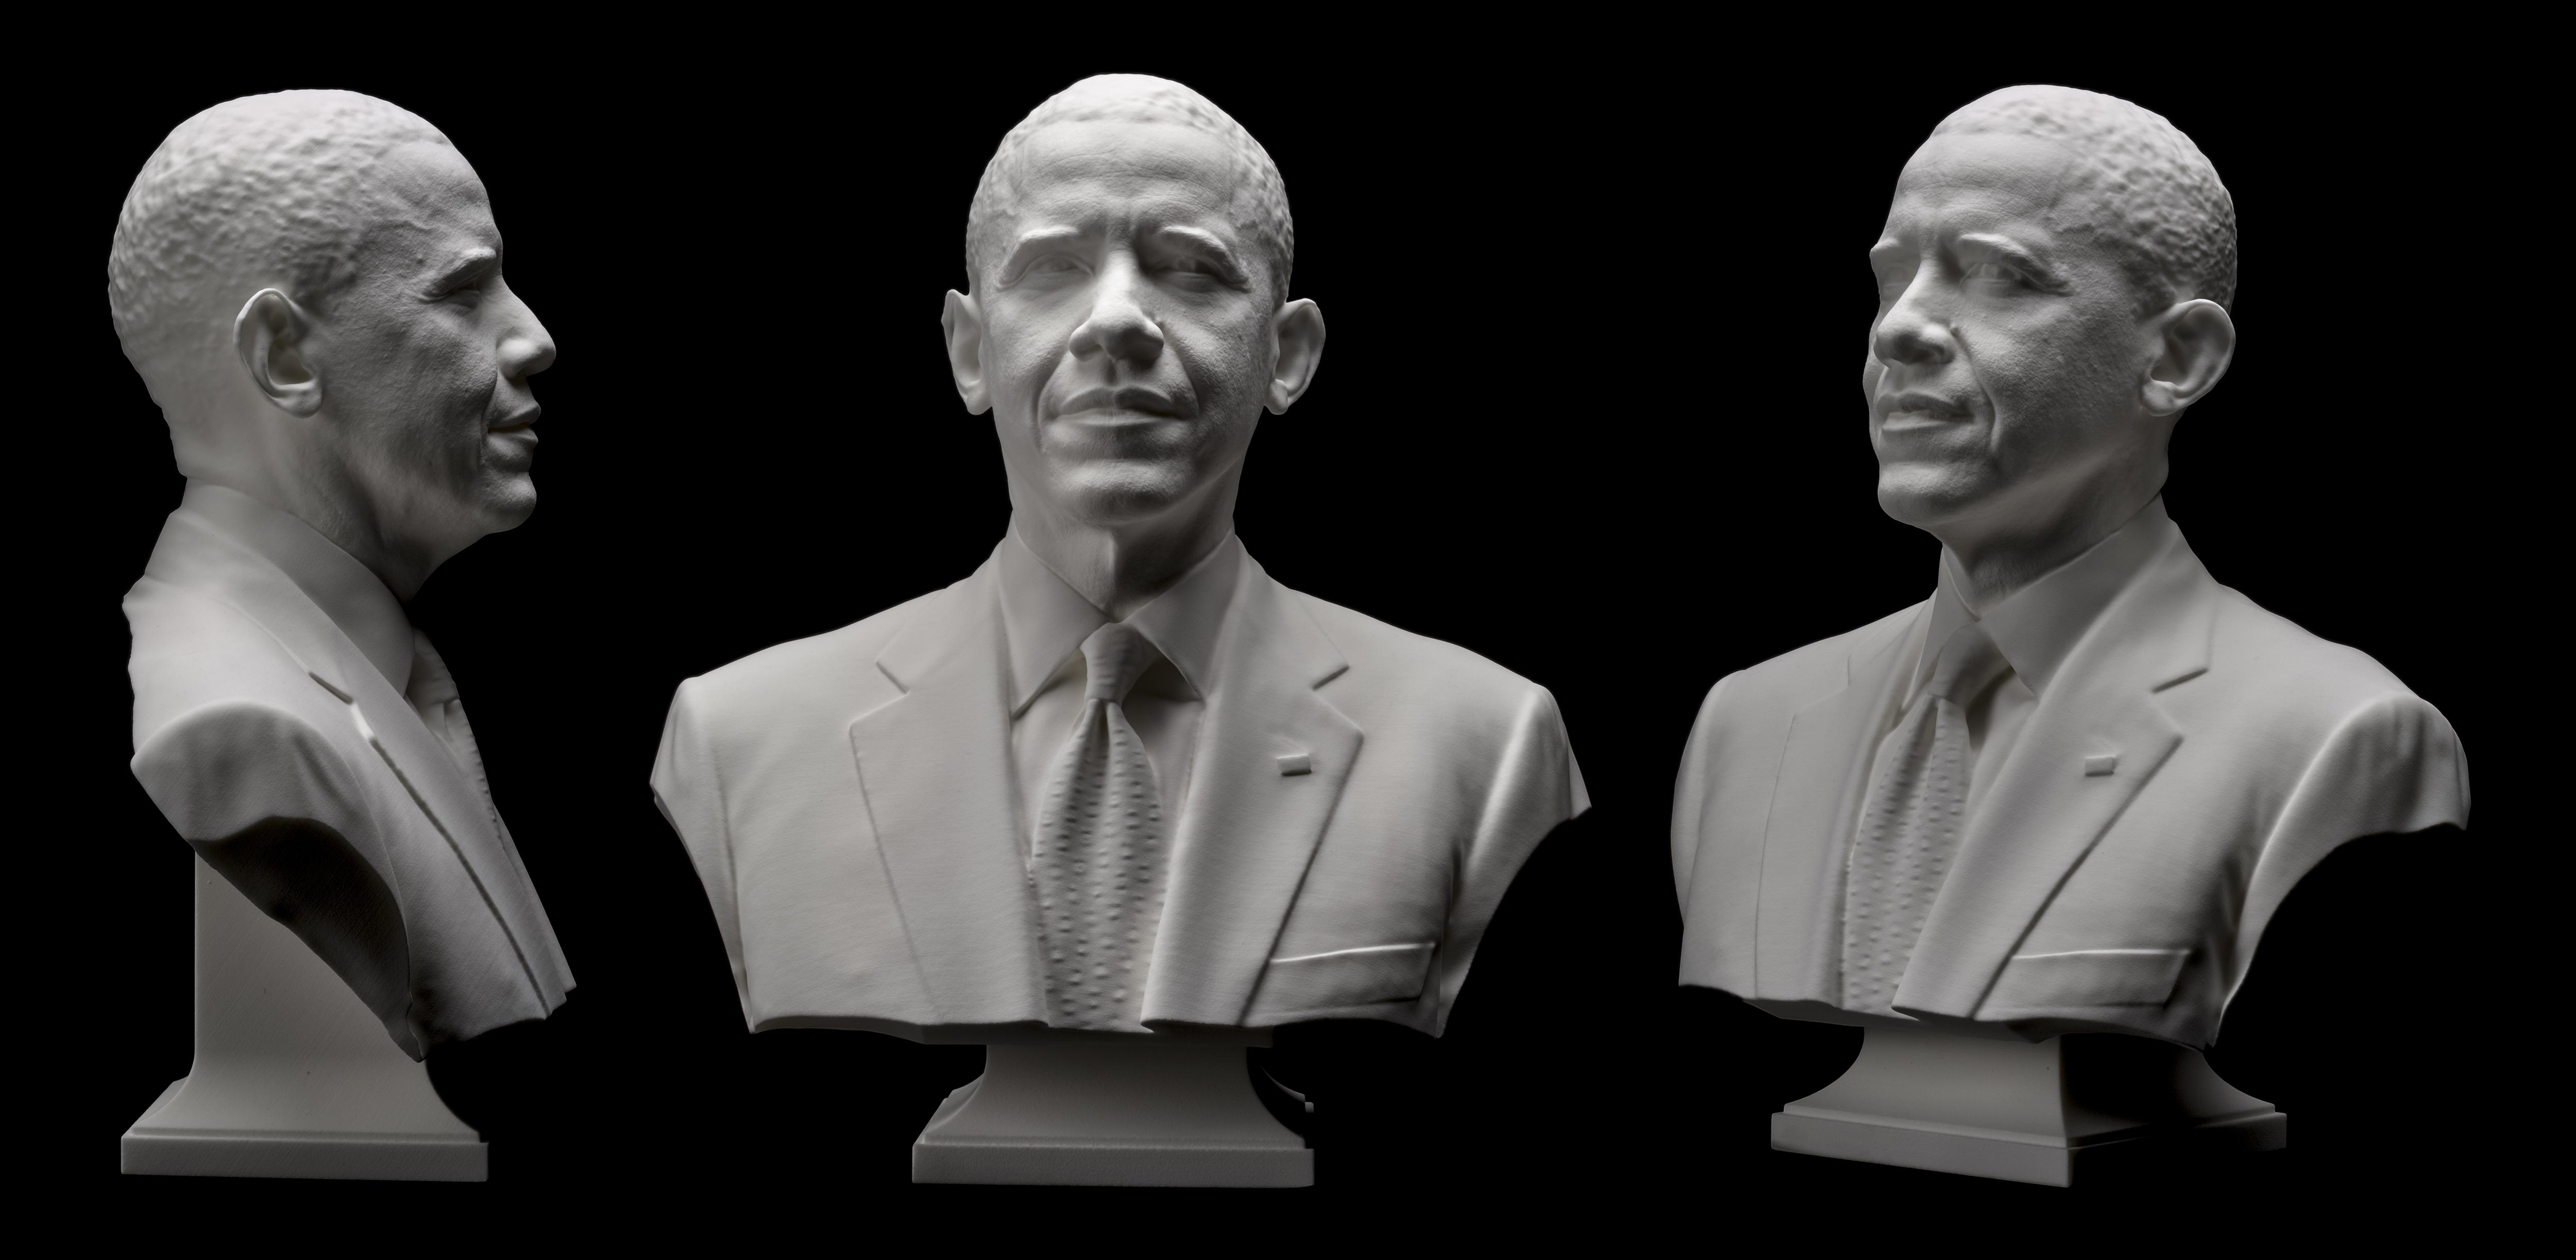 3D portrait of President Obama  Smithsonian Insider